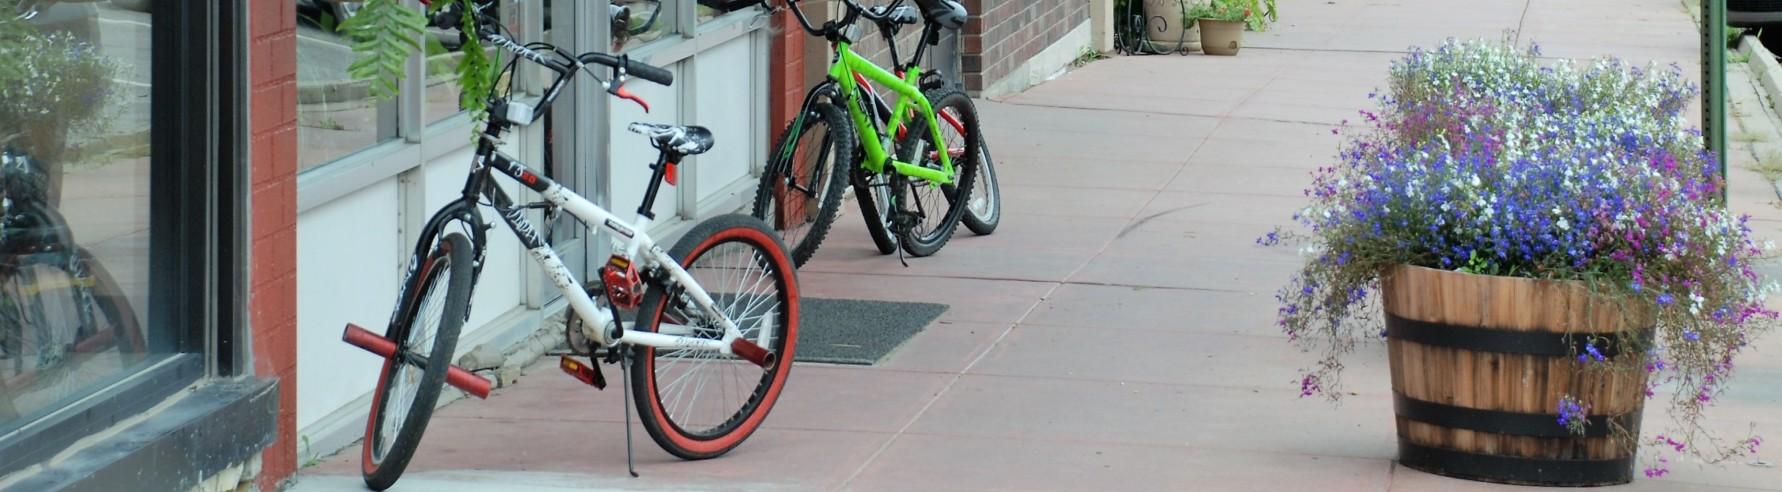 sidewalk---bikes-w3565-w1782.jpg